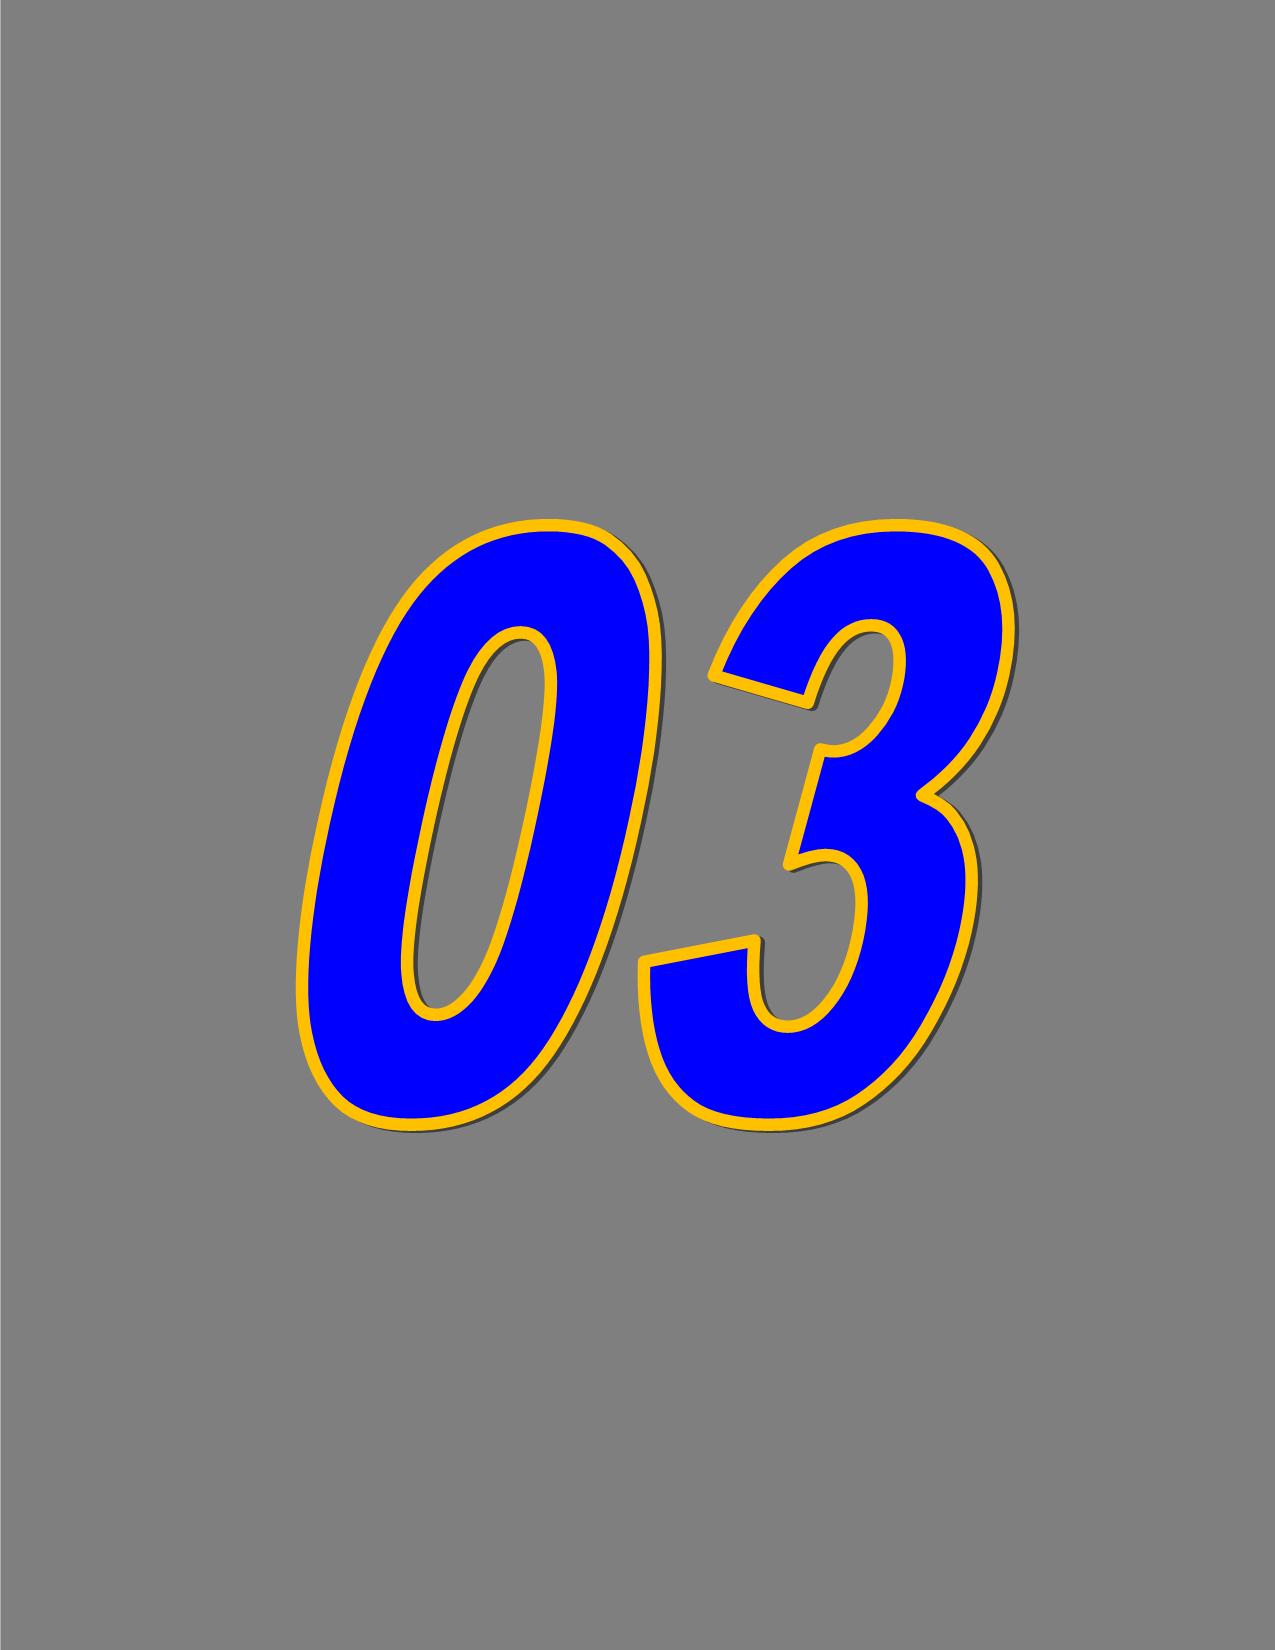 Number 03